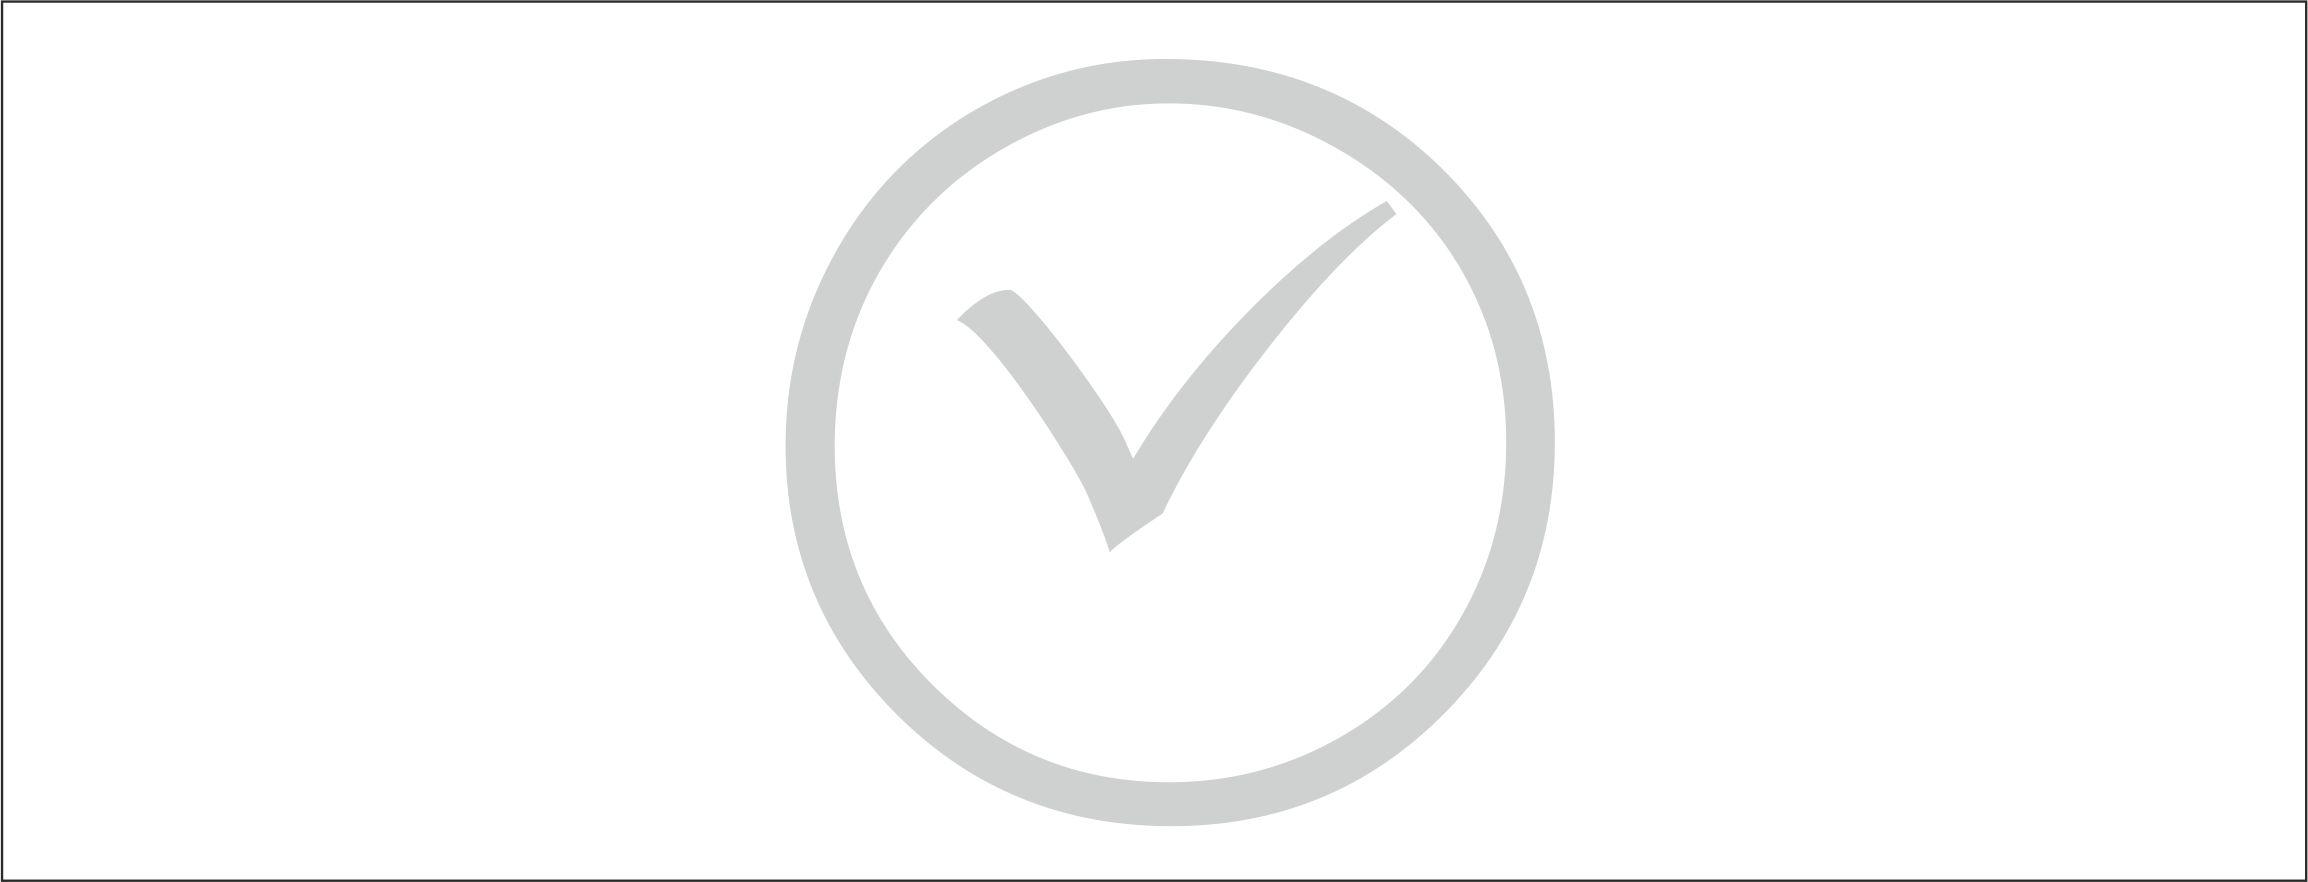 ДИЗАЙН С НОЛЯ ЛОГОТИПА (бюджет повышен) фото f_92750c869d68efc9.jpg